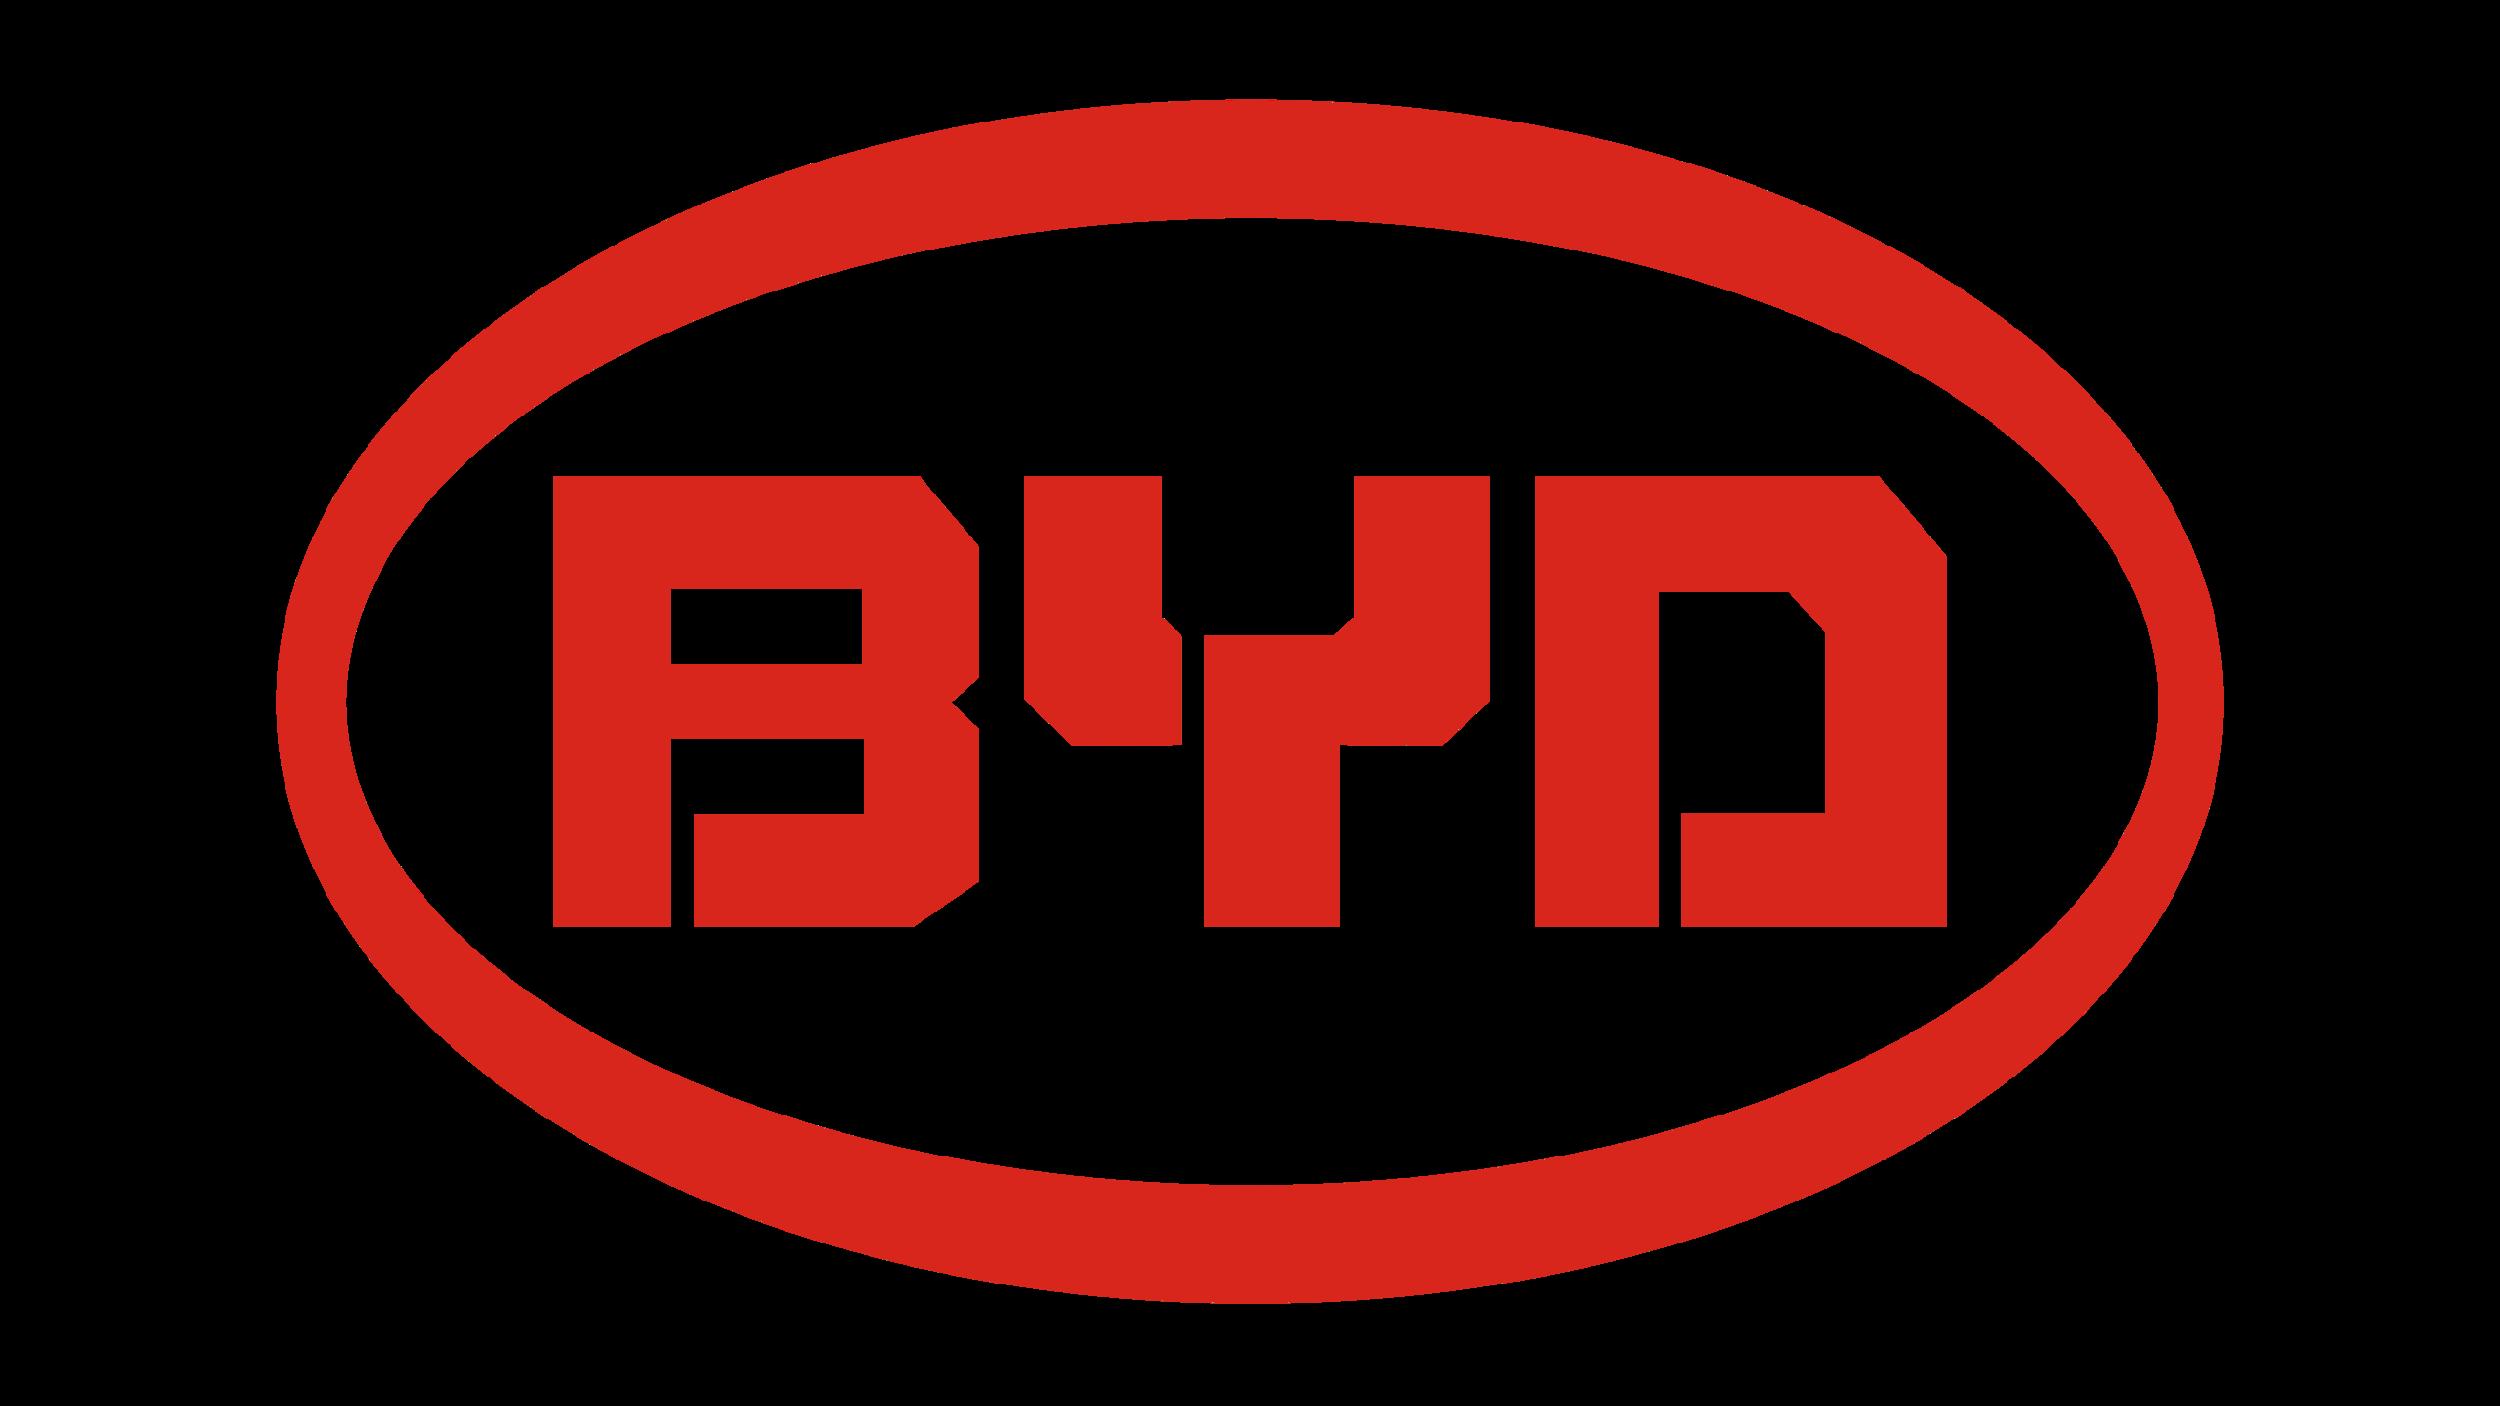 BYD-logo-2007-2560x1440.png